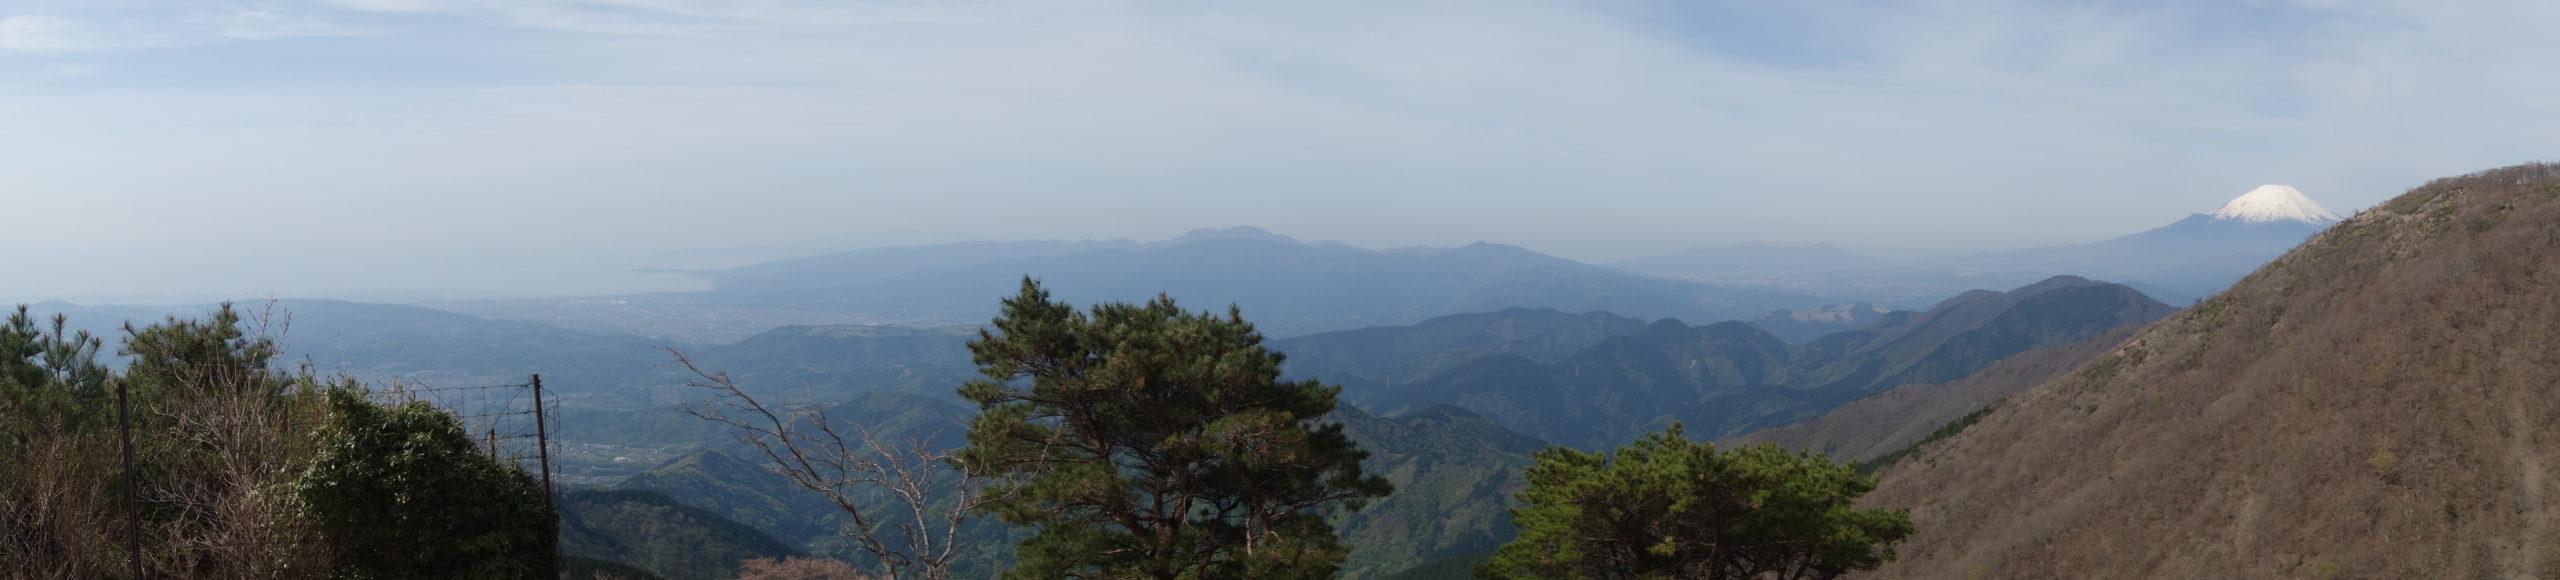 丹沢山 花立山荘〜塔の岳